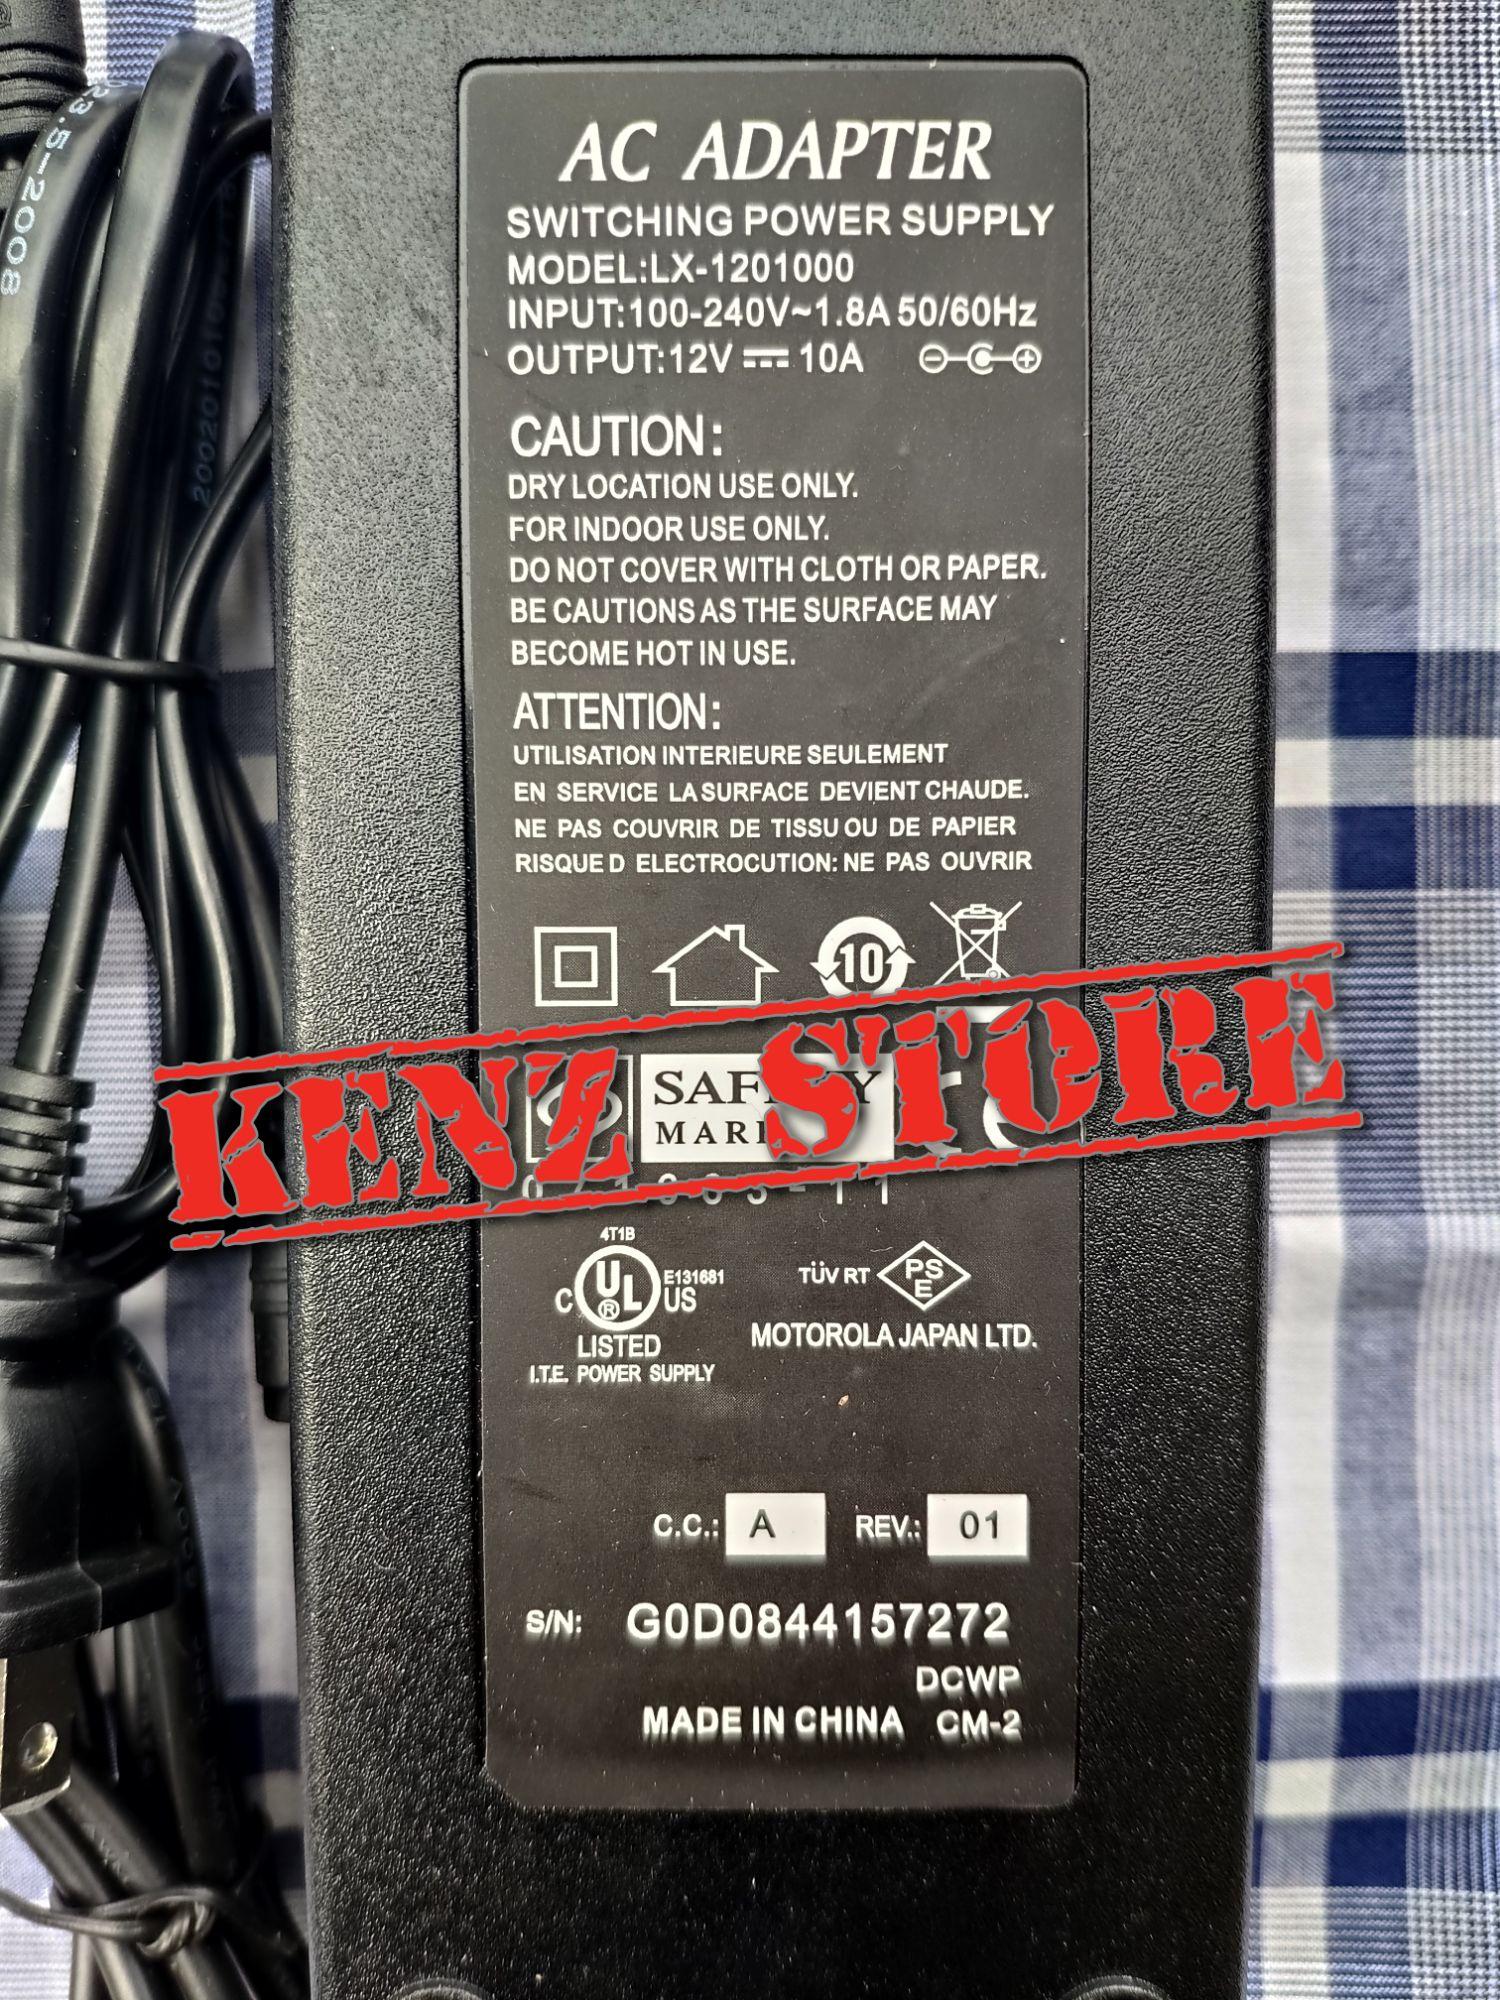 Adapter 12v10a loại tốt nguồn 12v10a adapter đổi nguồn 220v-12v10a Adapter 12v 10a